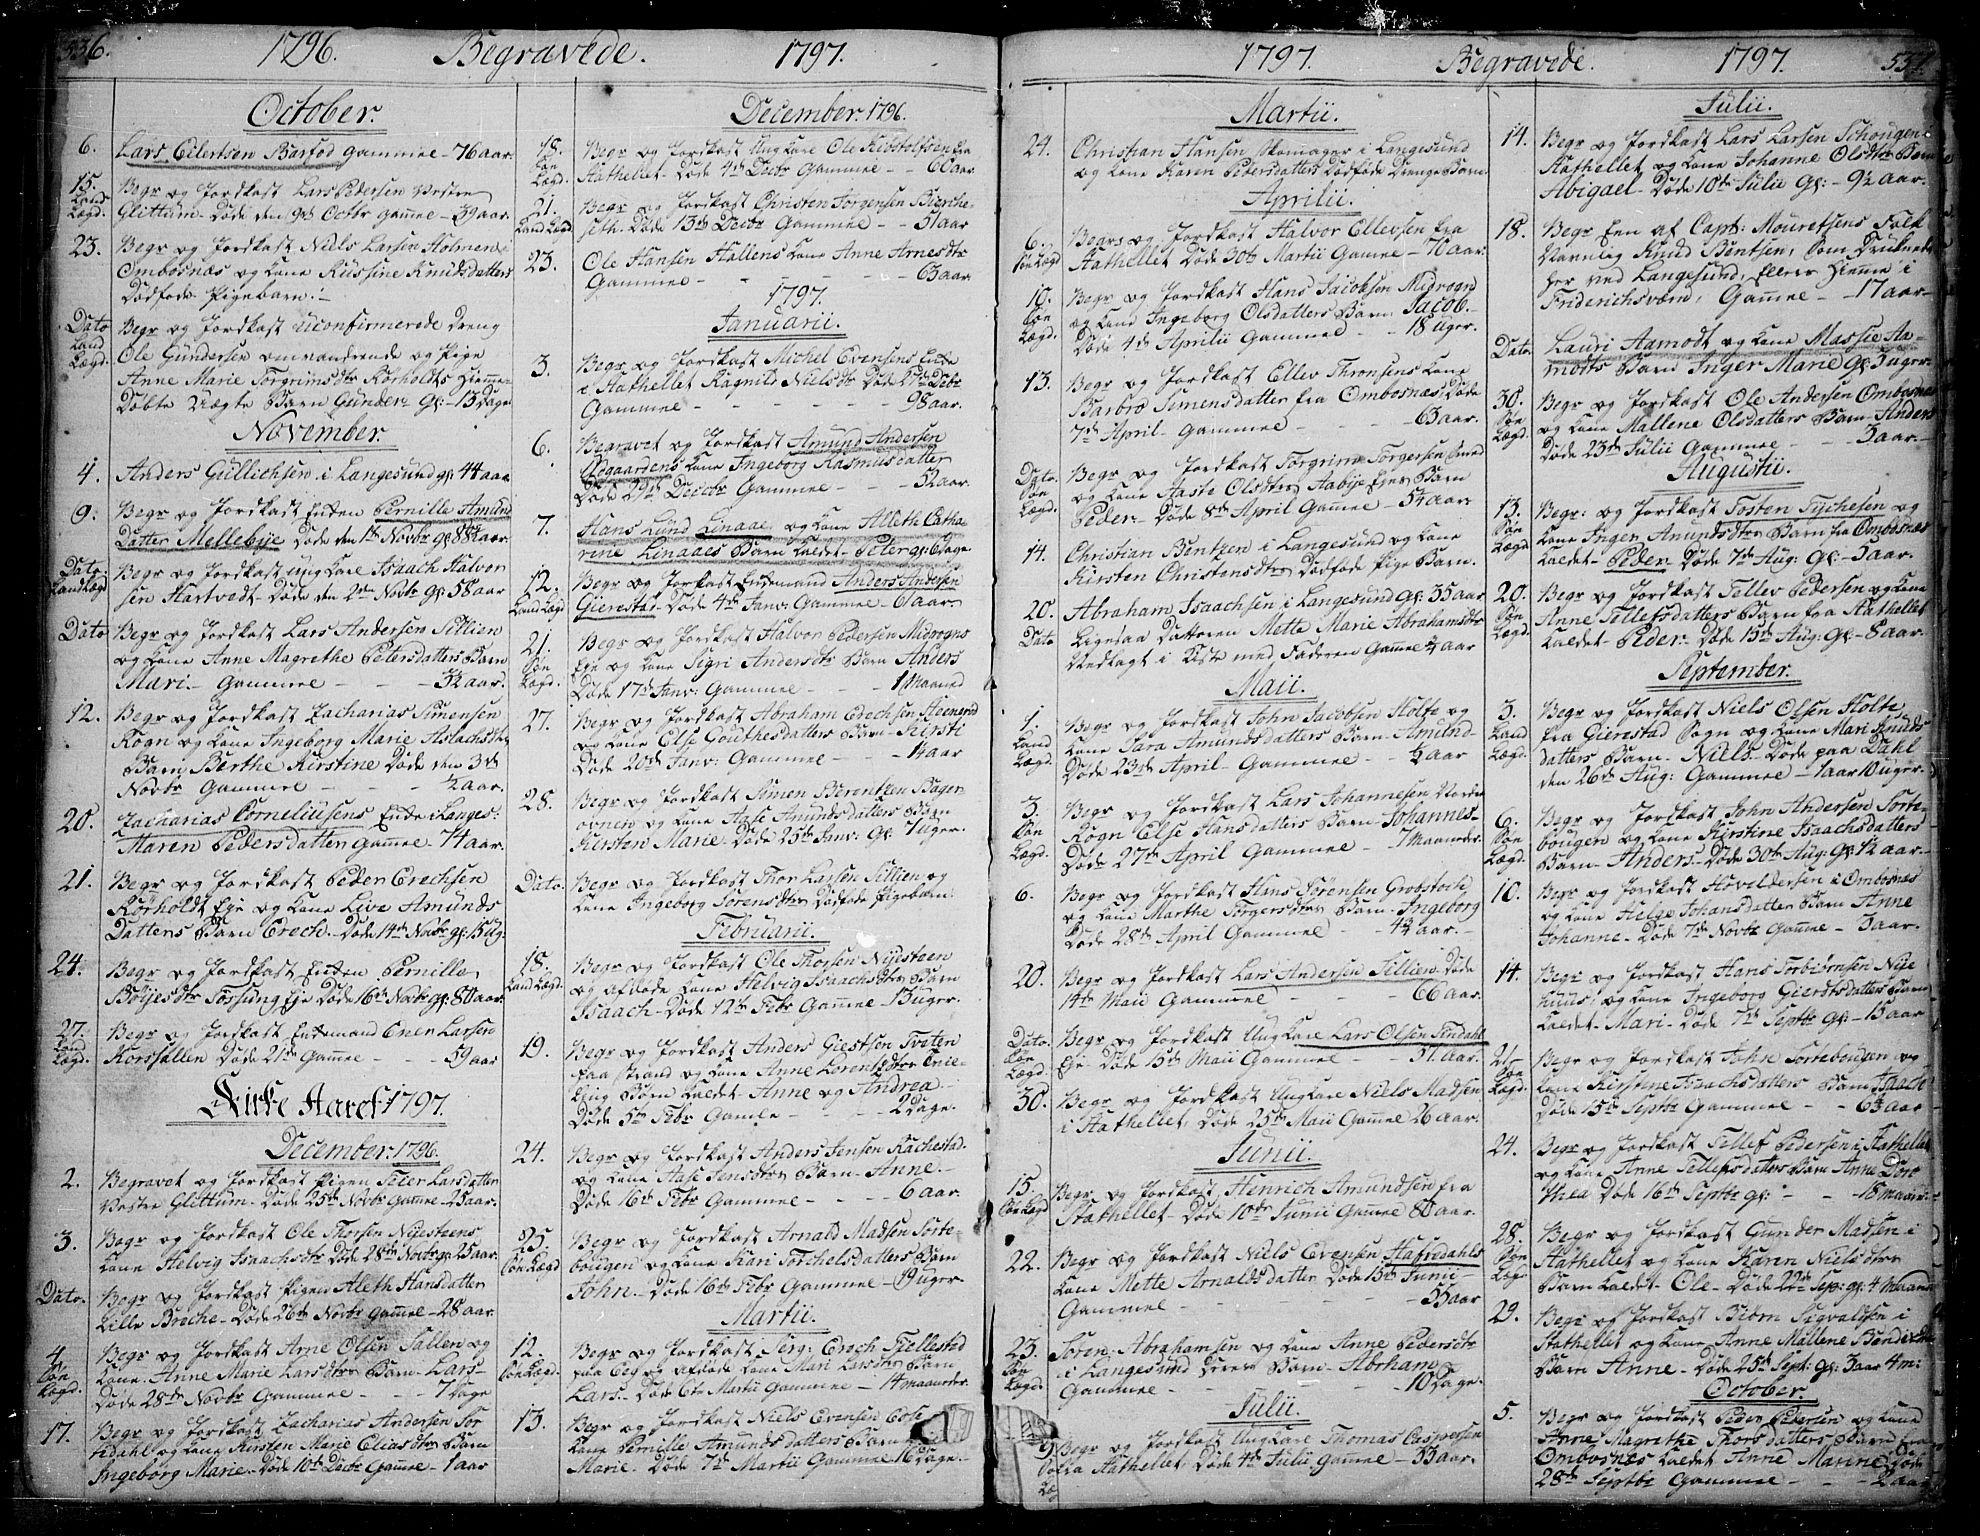 SAKO, Bamble kirkebøker, F/Fa/L0002: Ministerialbok nr. I 2, 1775-1814, s. 536-537